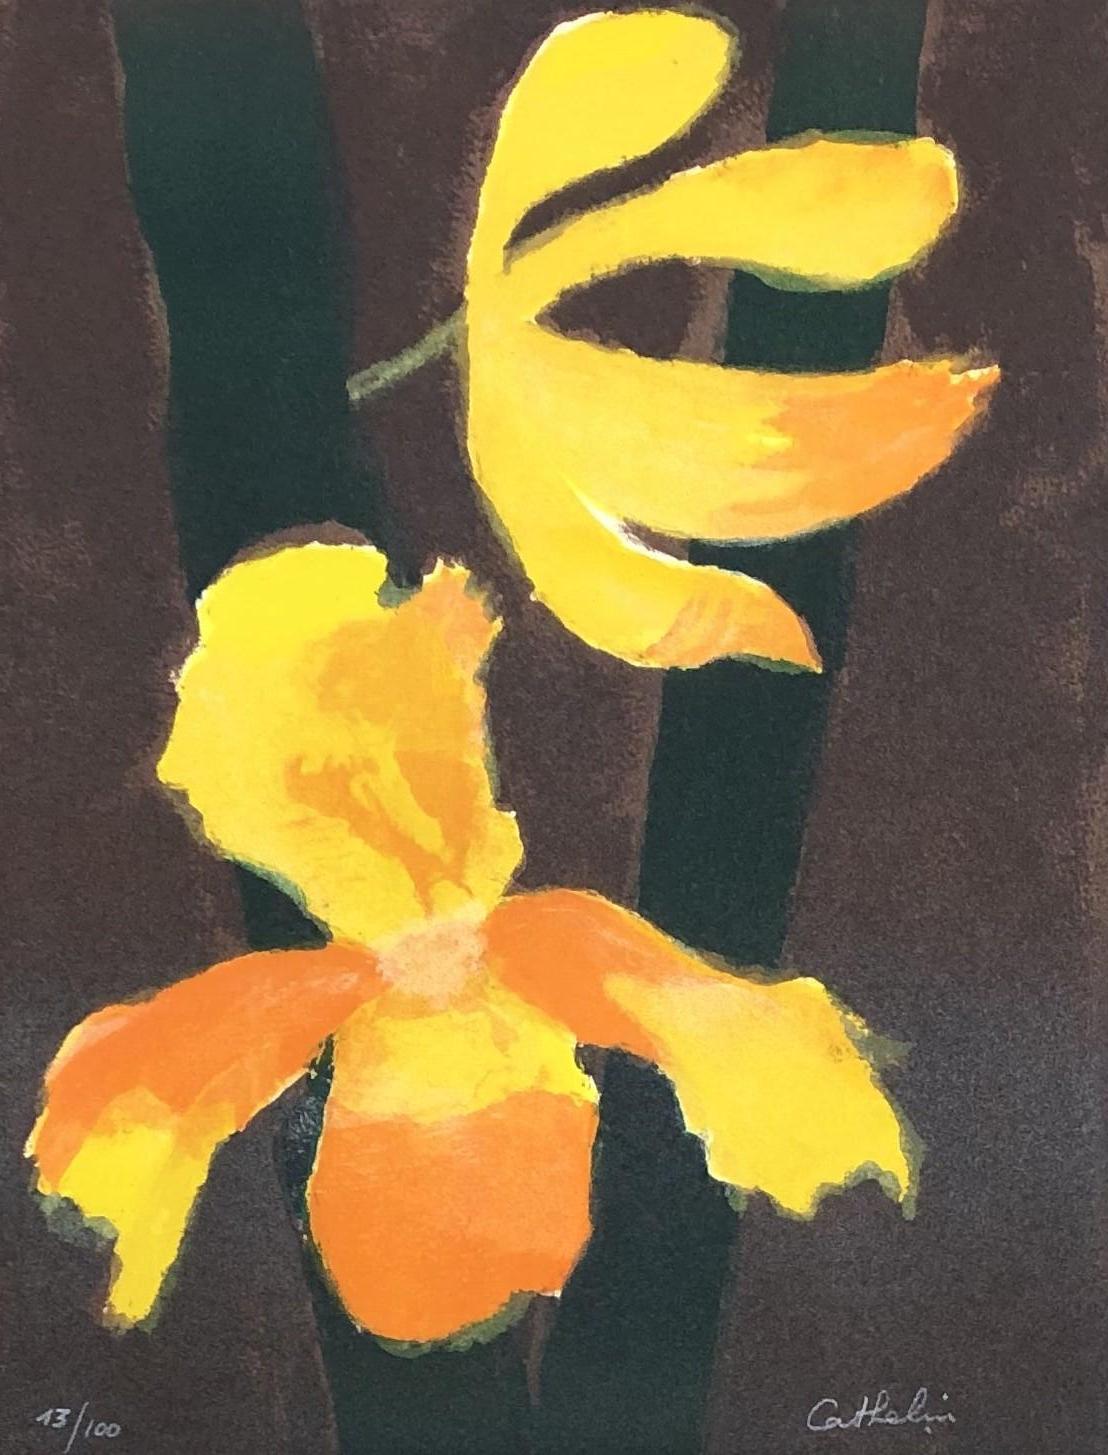 Orchids - Original lithograph handsigned - 100 copies